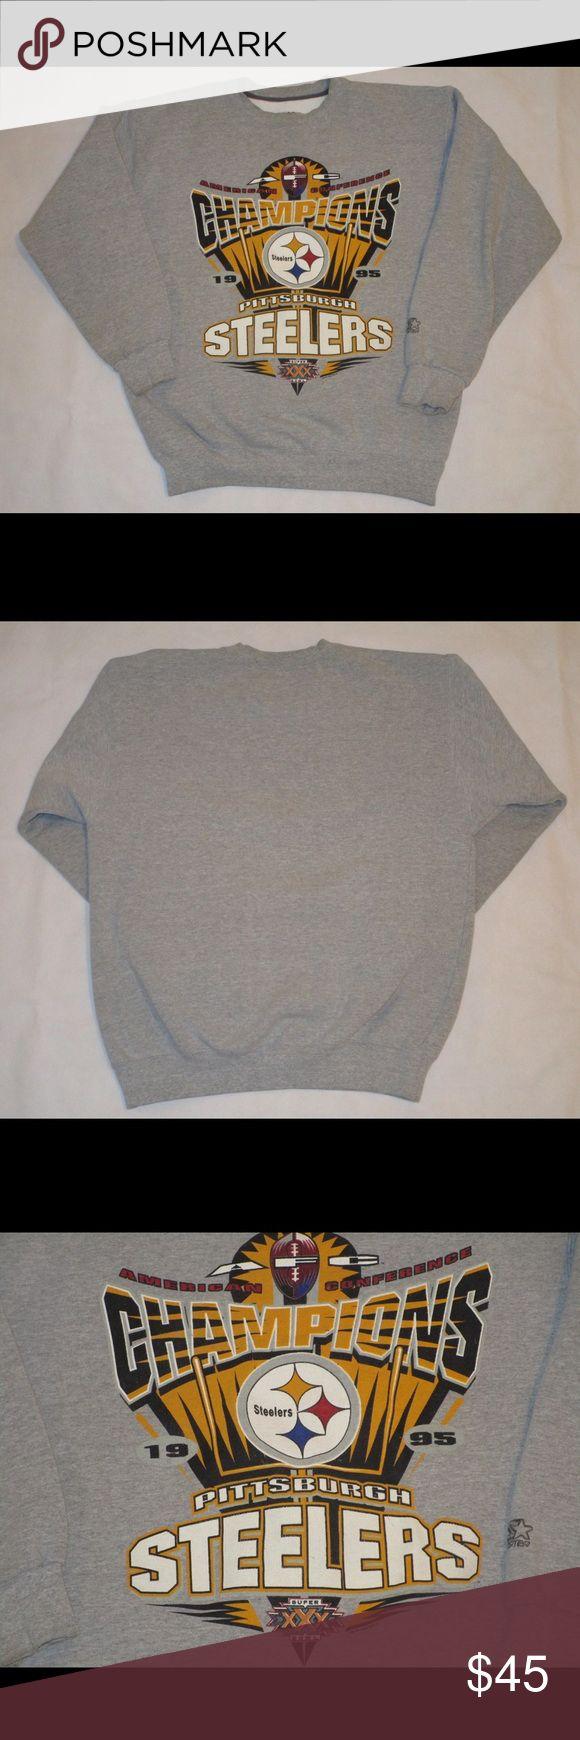 Vintage Pittsburgh Steelers Sweatshirt Vintage Pittsburgh Steelers Starter sweatshirt in great vintage condition! Shirts